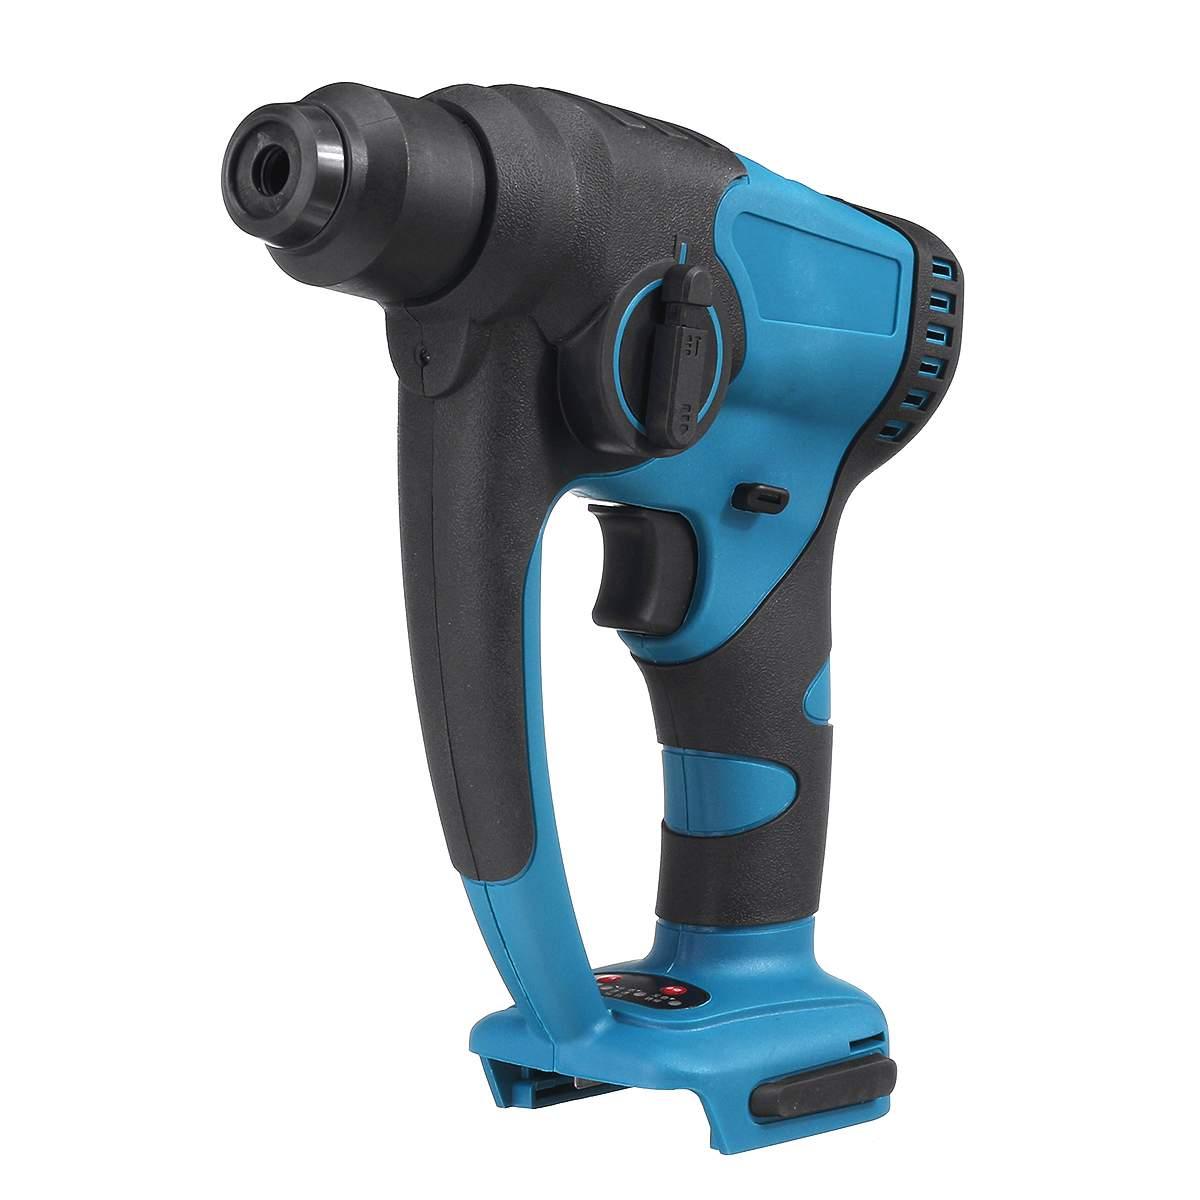 4Pcs Carbon Brushes Set For Makita Series Impact Driver//Hammer Drill CB-440